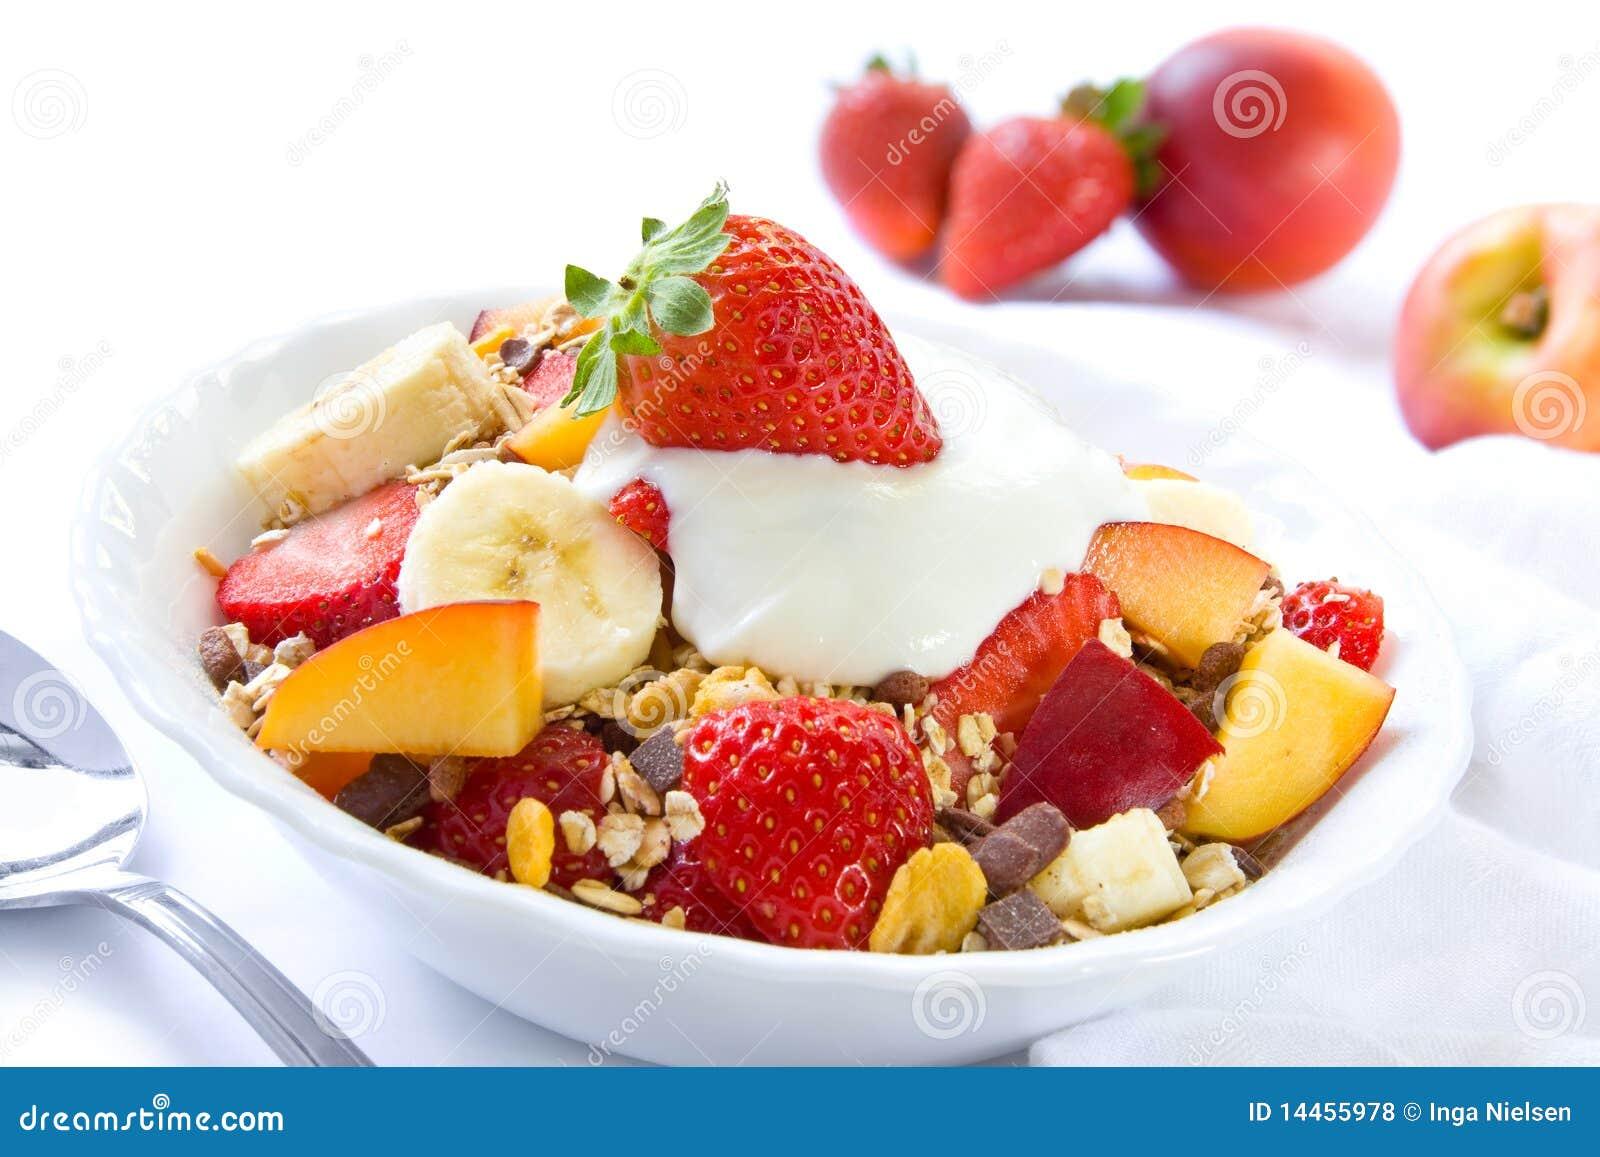 Healthy breakfast with cereals